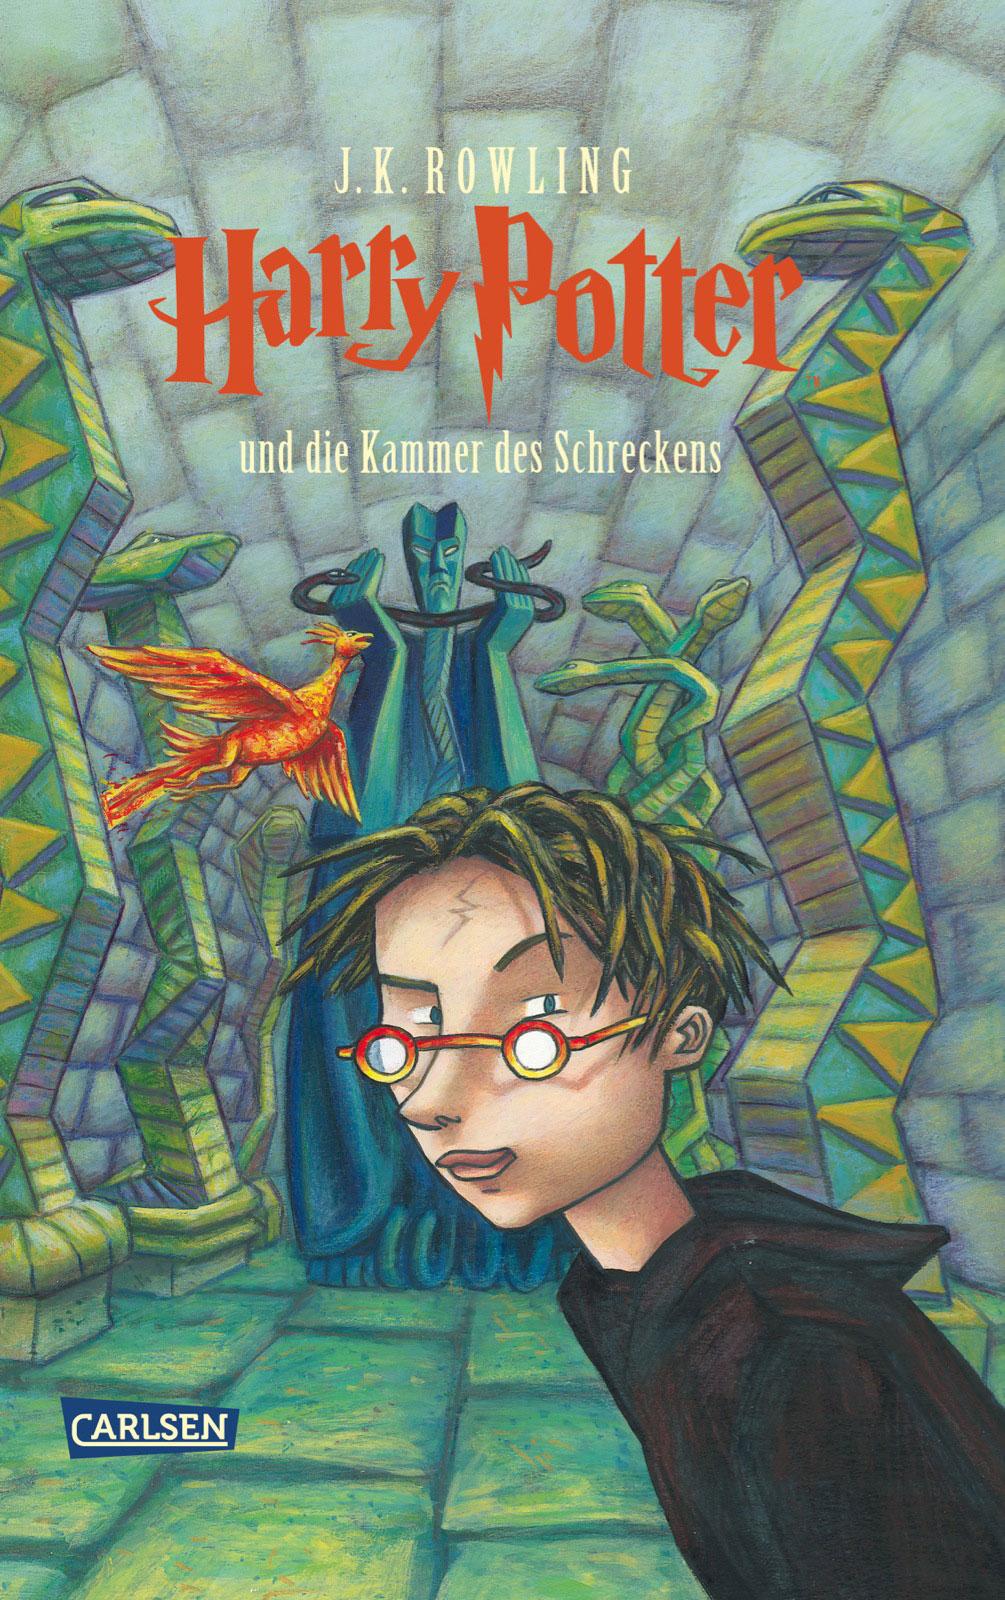 German children's cover